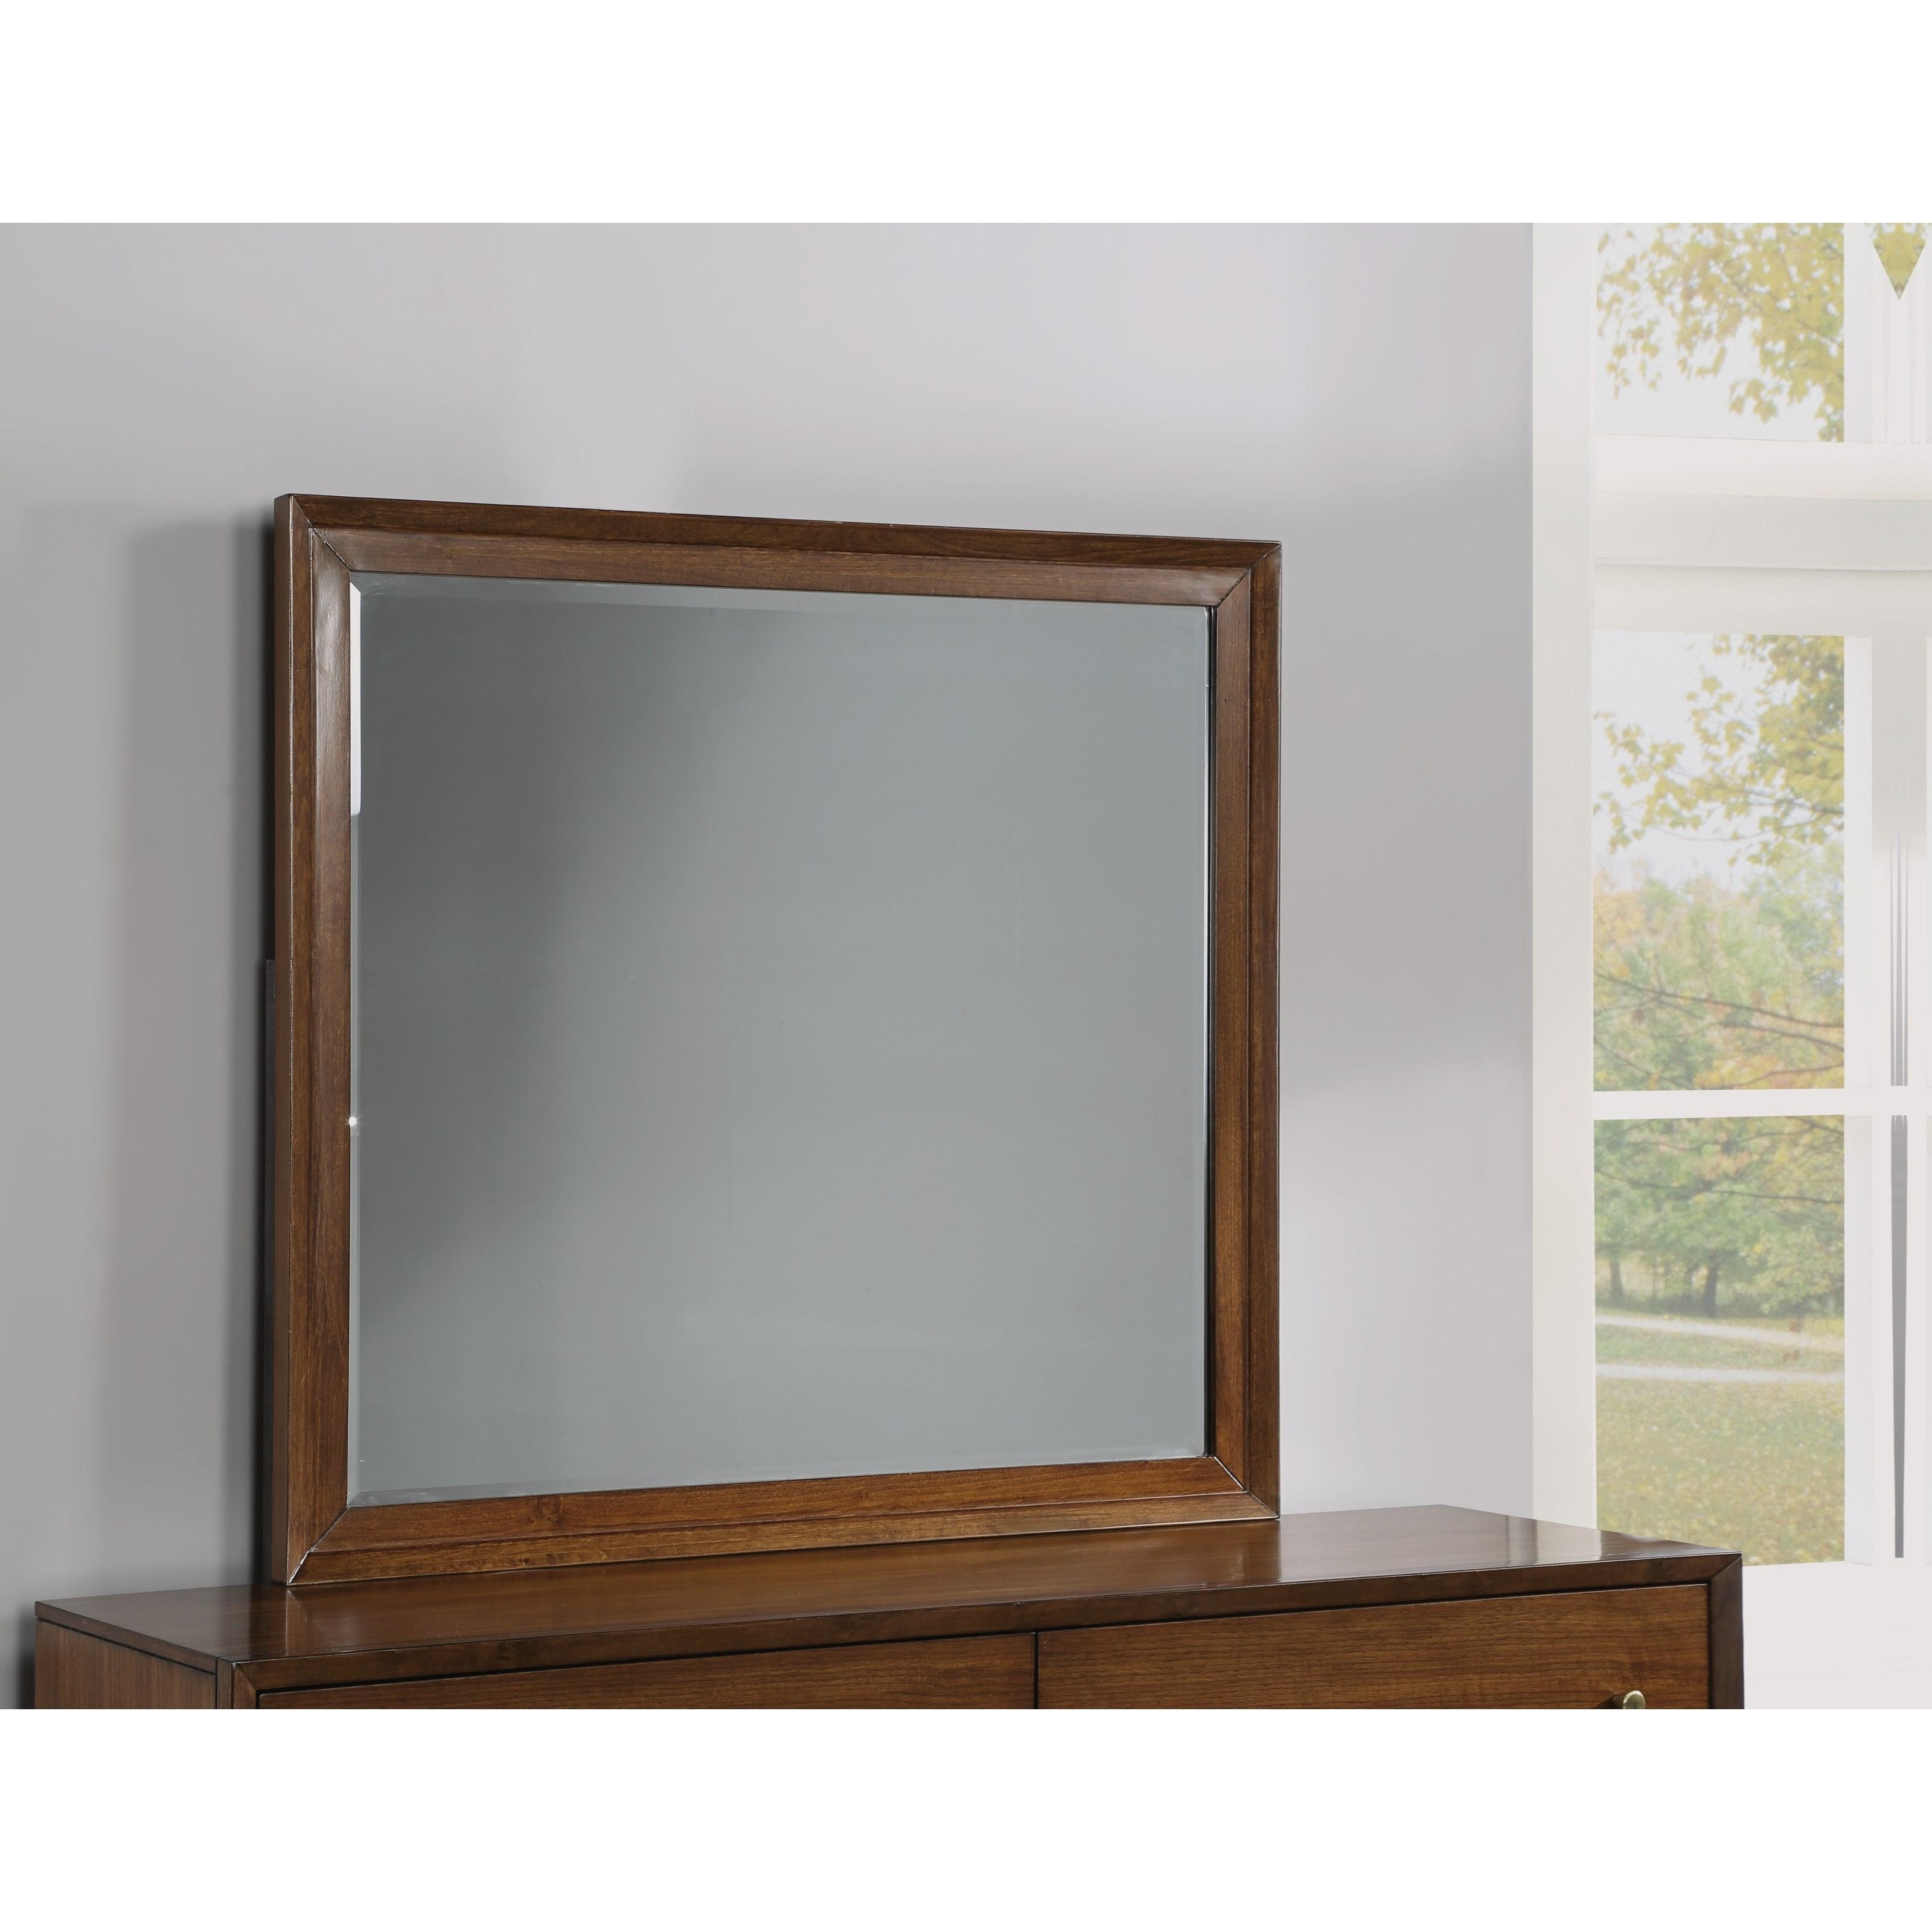 Carmen Carmen Dresser Mirror by Flexsteel Wynwood Collection at Morris Home